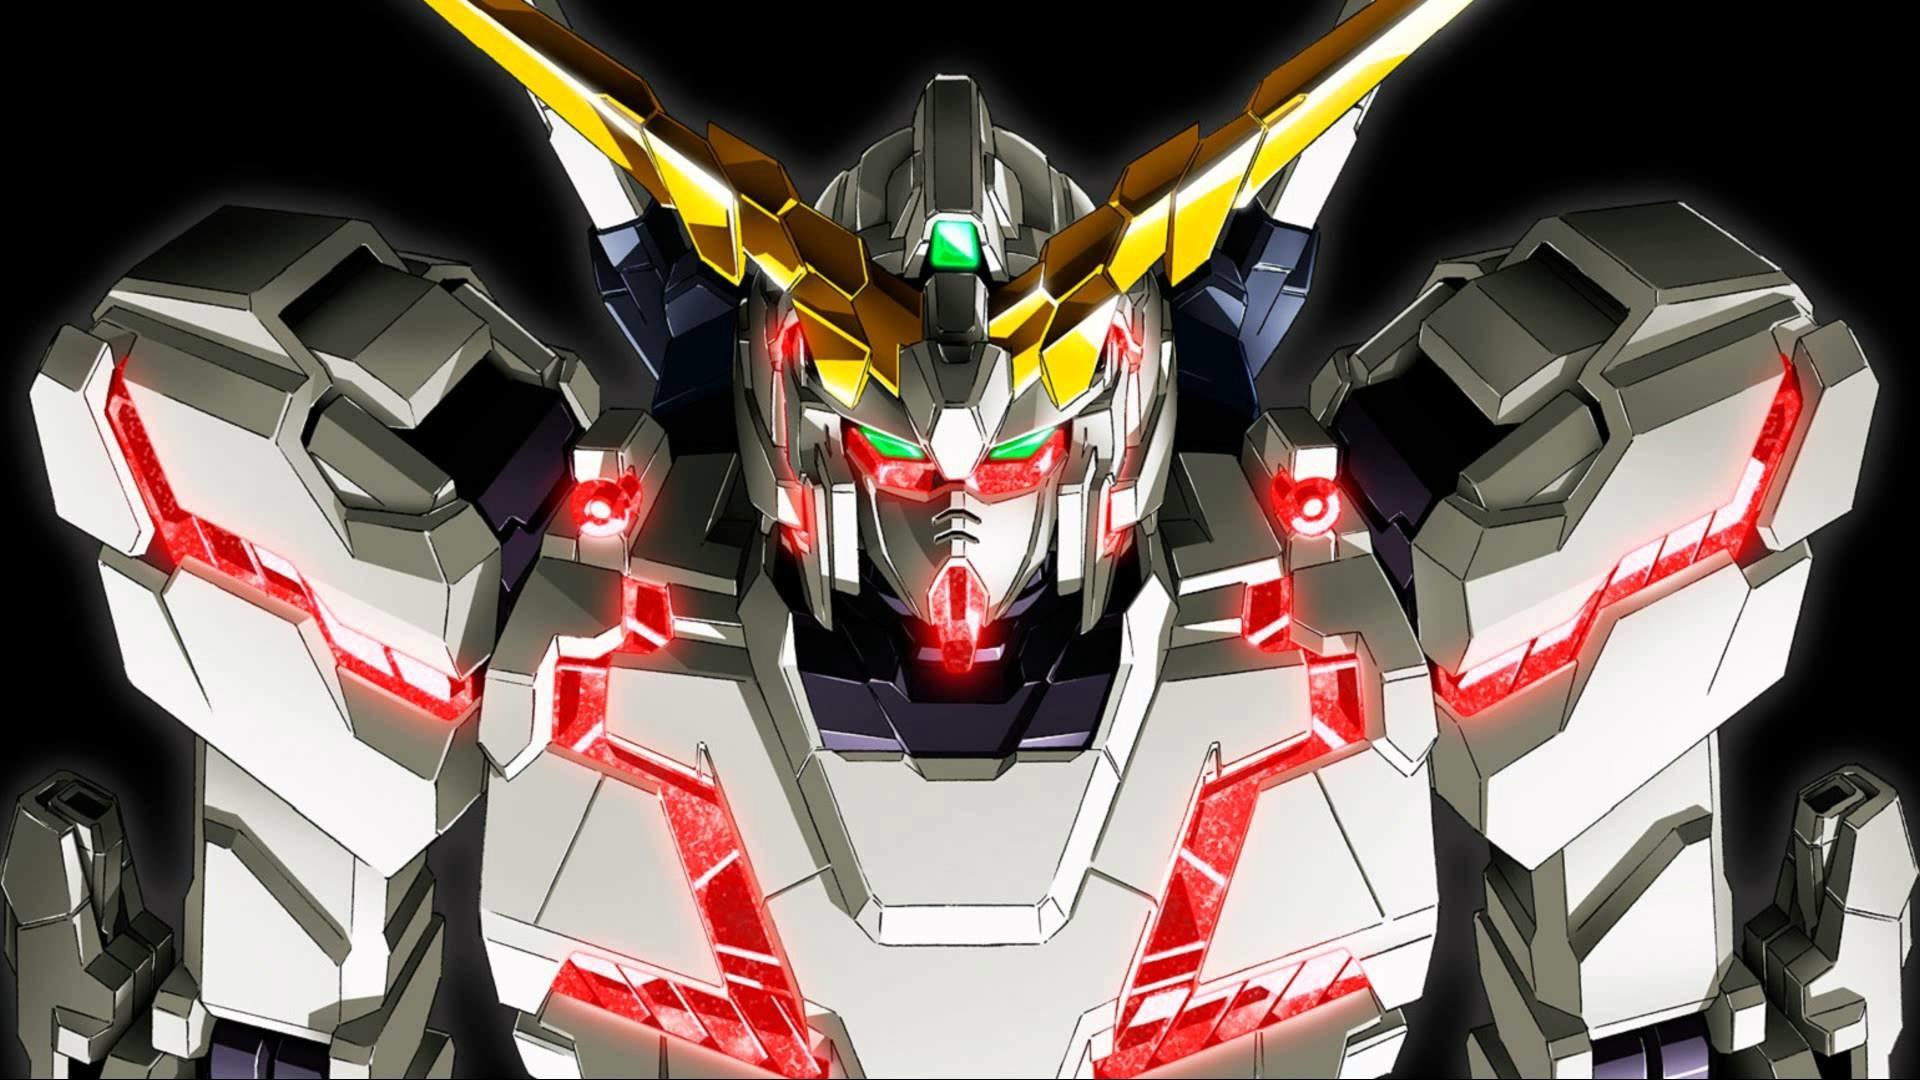 Neo Zeon – Gundam Unicorn OST 3 – 4 (High Quality 1080p HD)